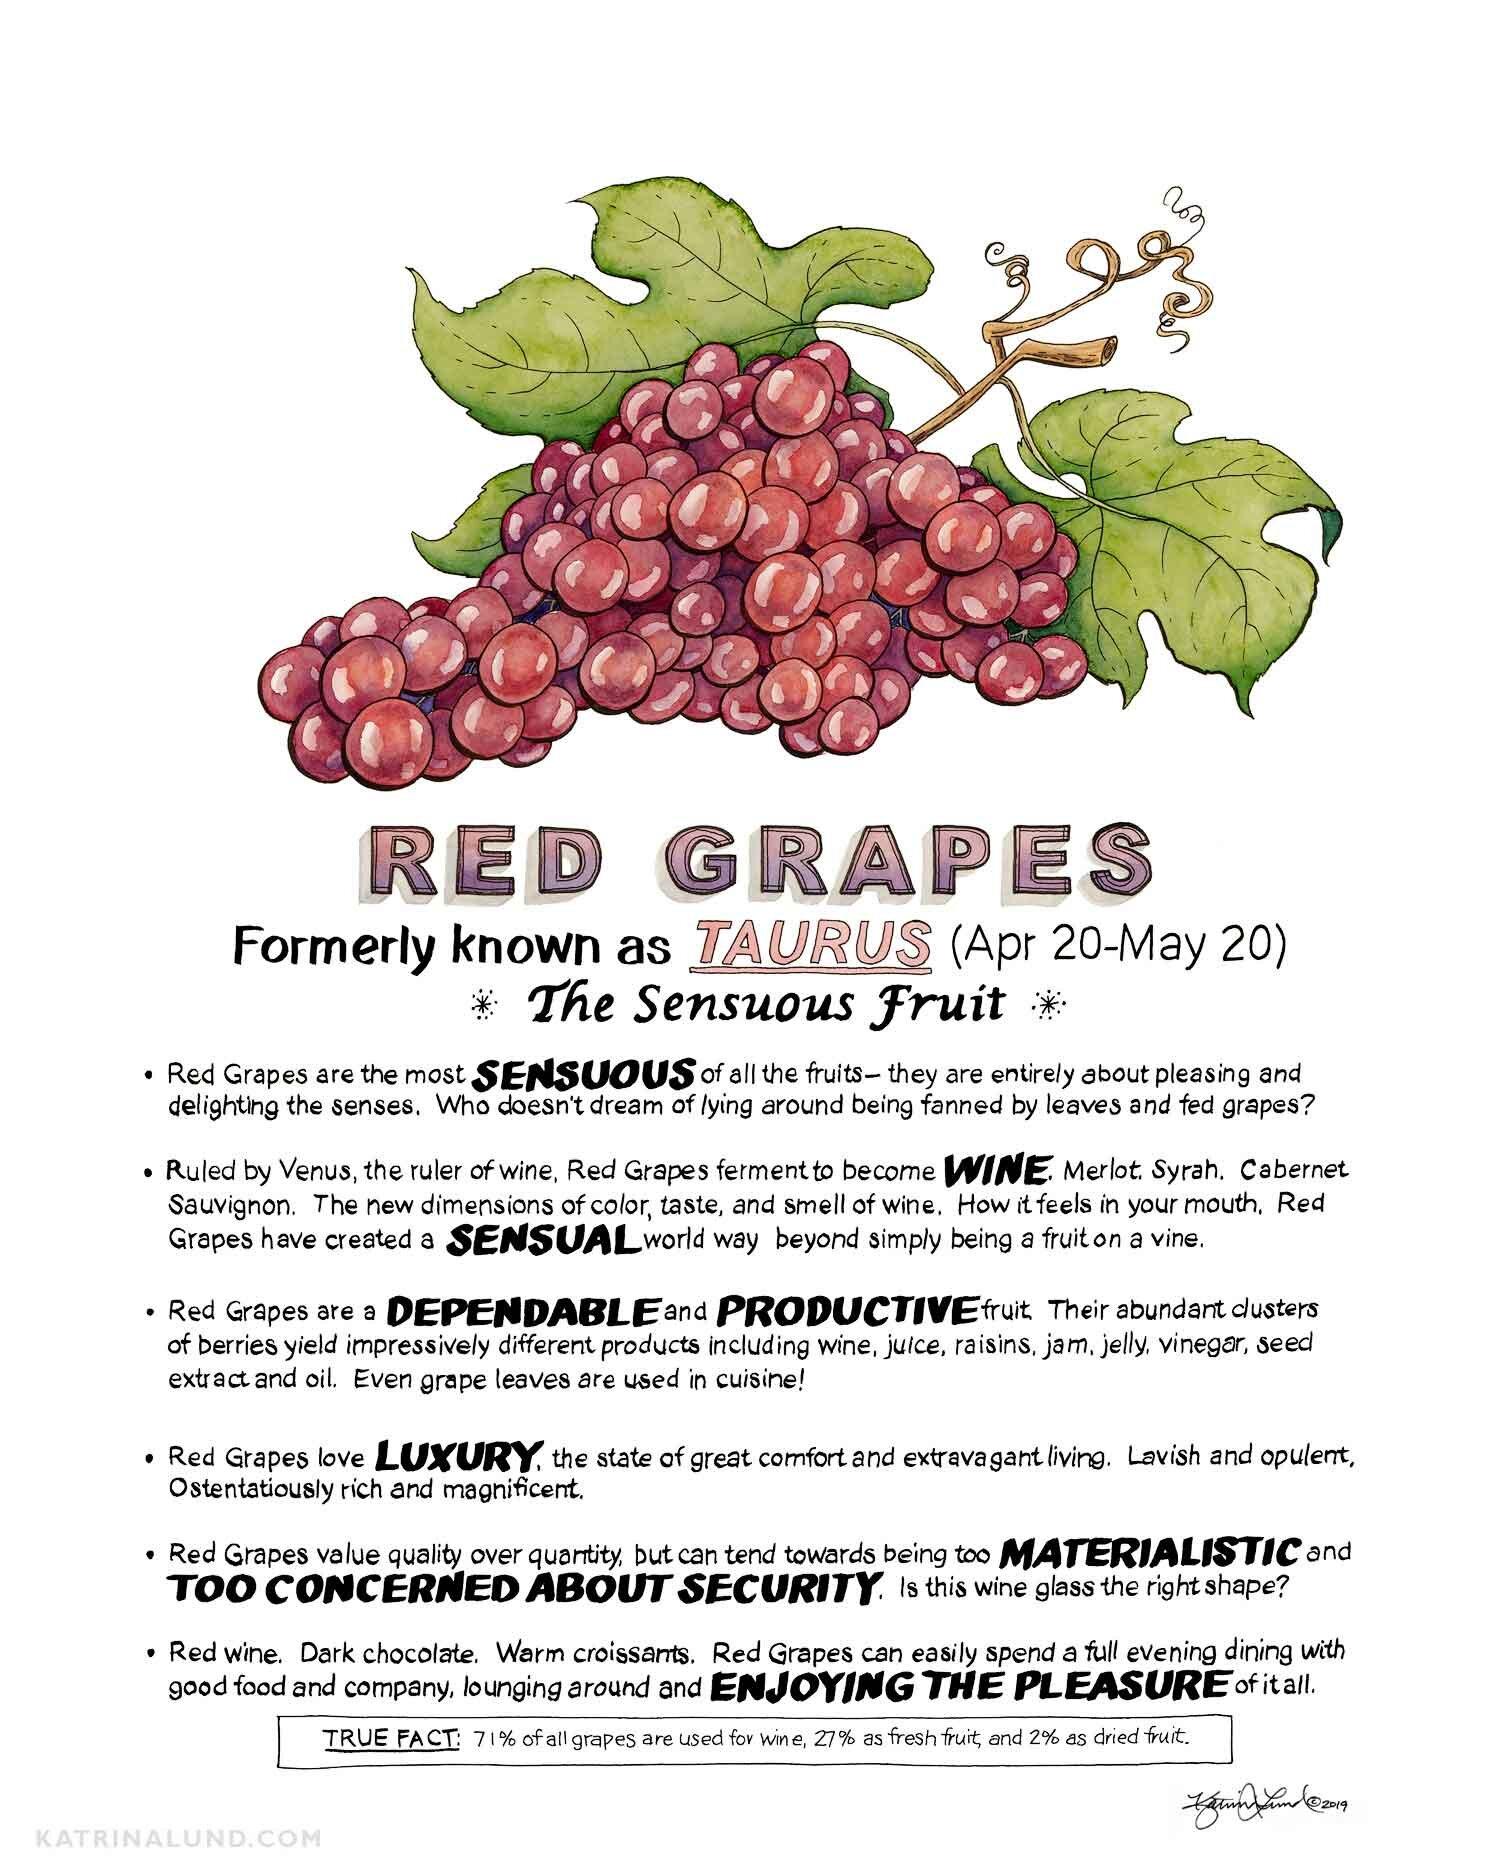 KatrinaLundArt_FruitAstrology_Red-Grapes_web.jpg